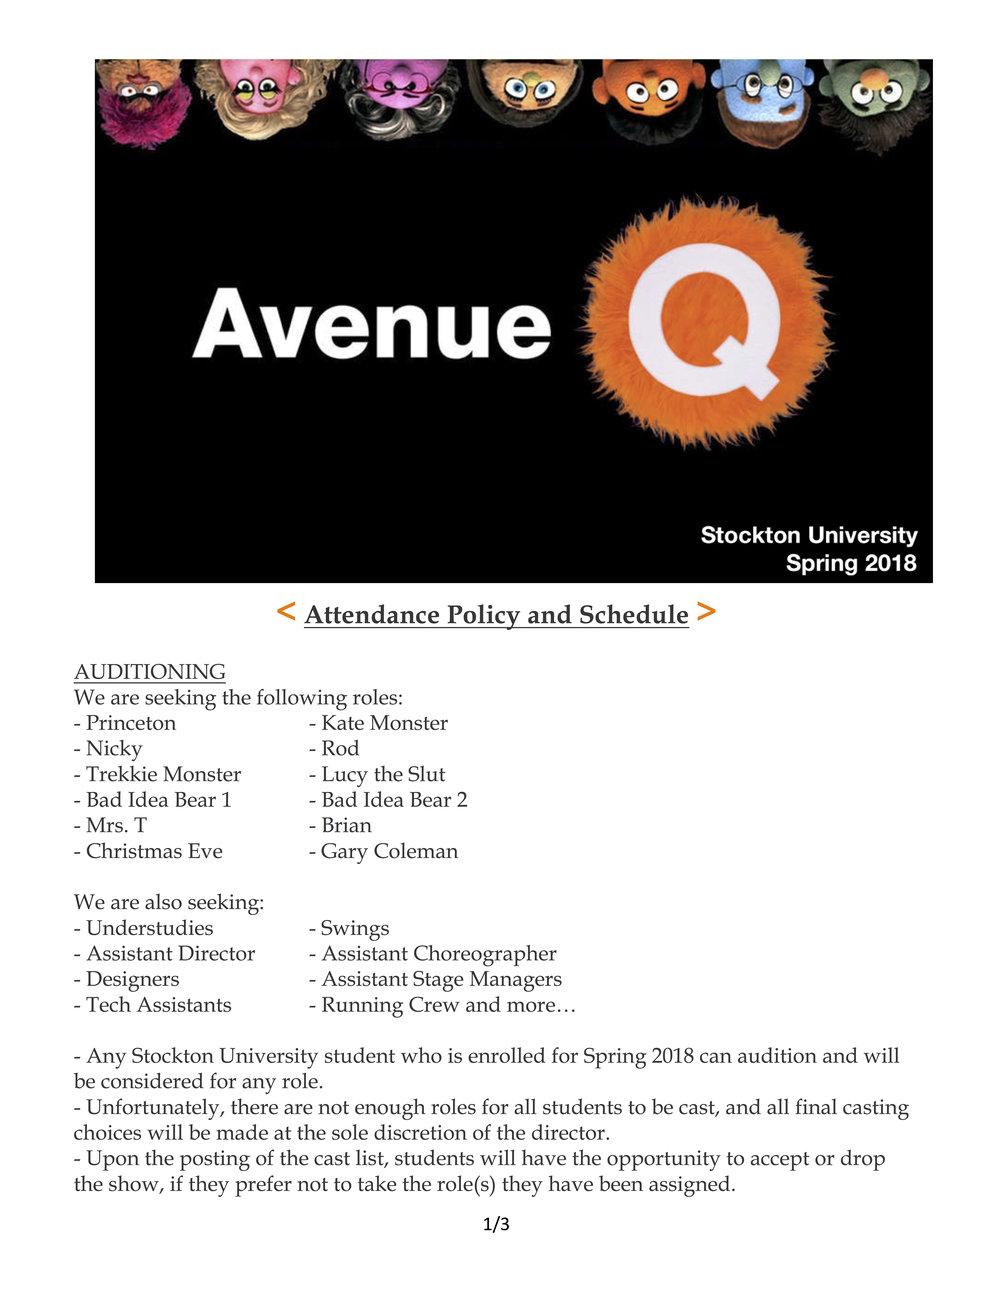 AVE Q attendance policy p all JPG.jpg